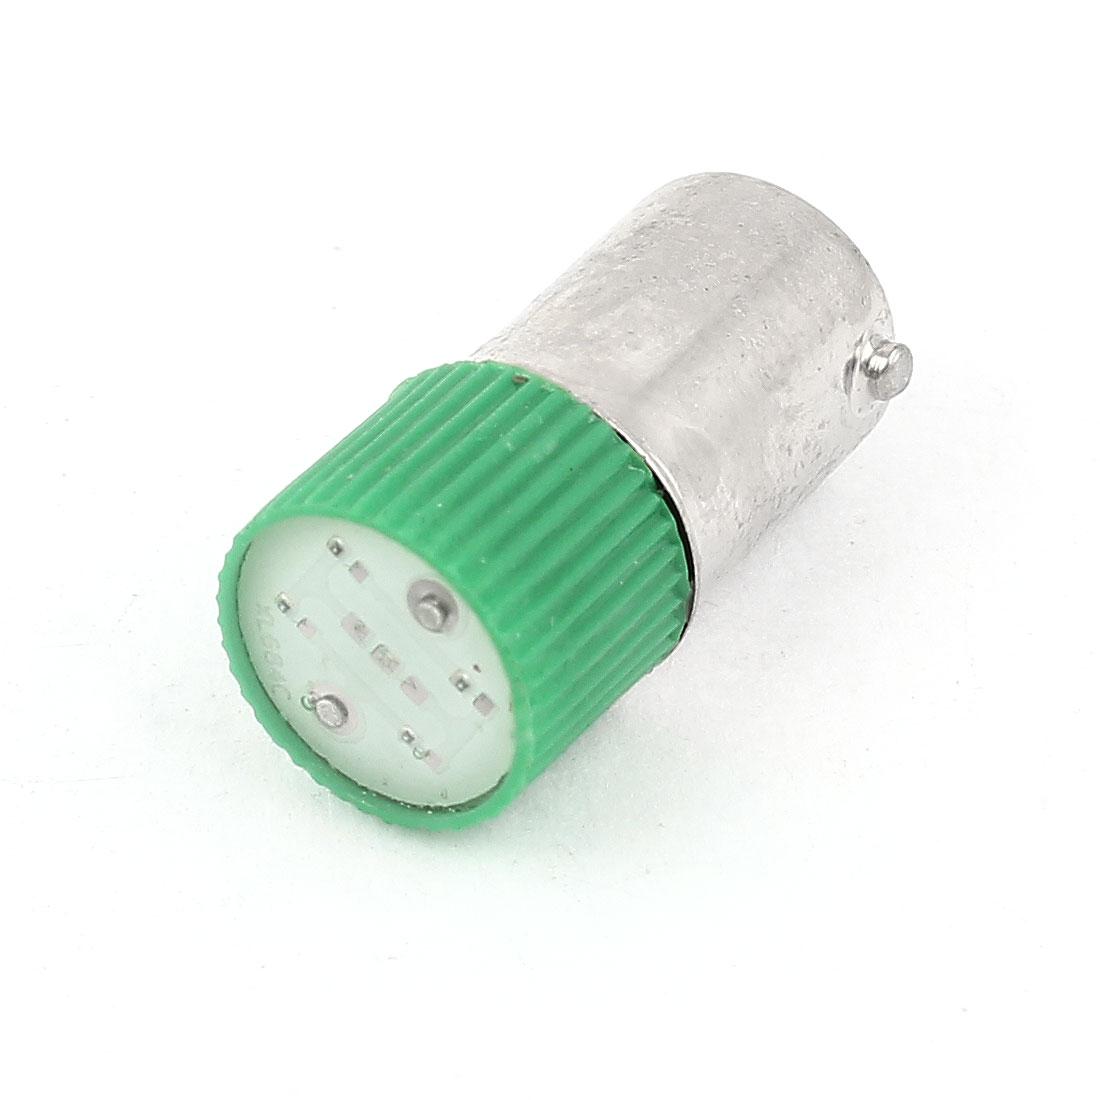 10mm Dia Round Shaped Head Green LED Light Signal Indicator Lamp AC 220V/240V 3A